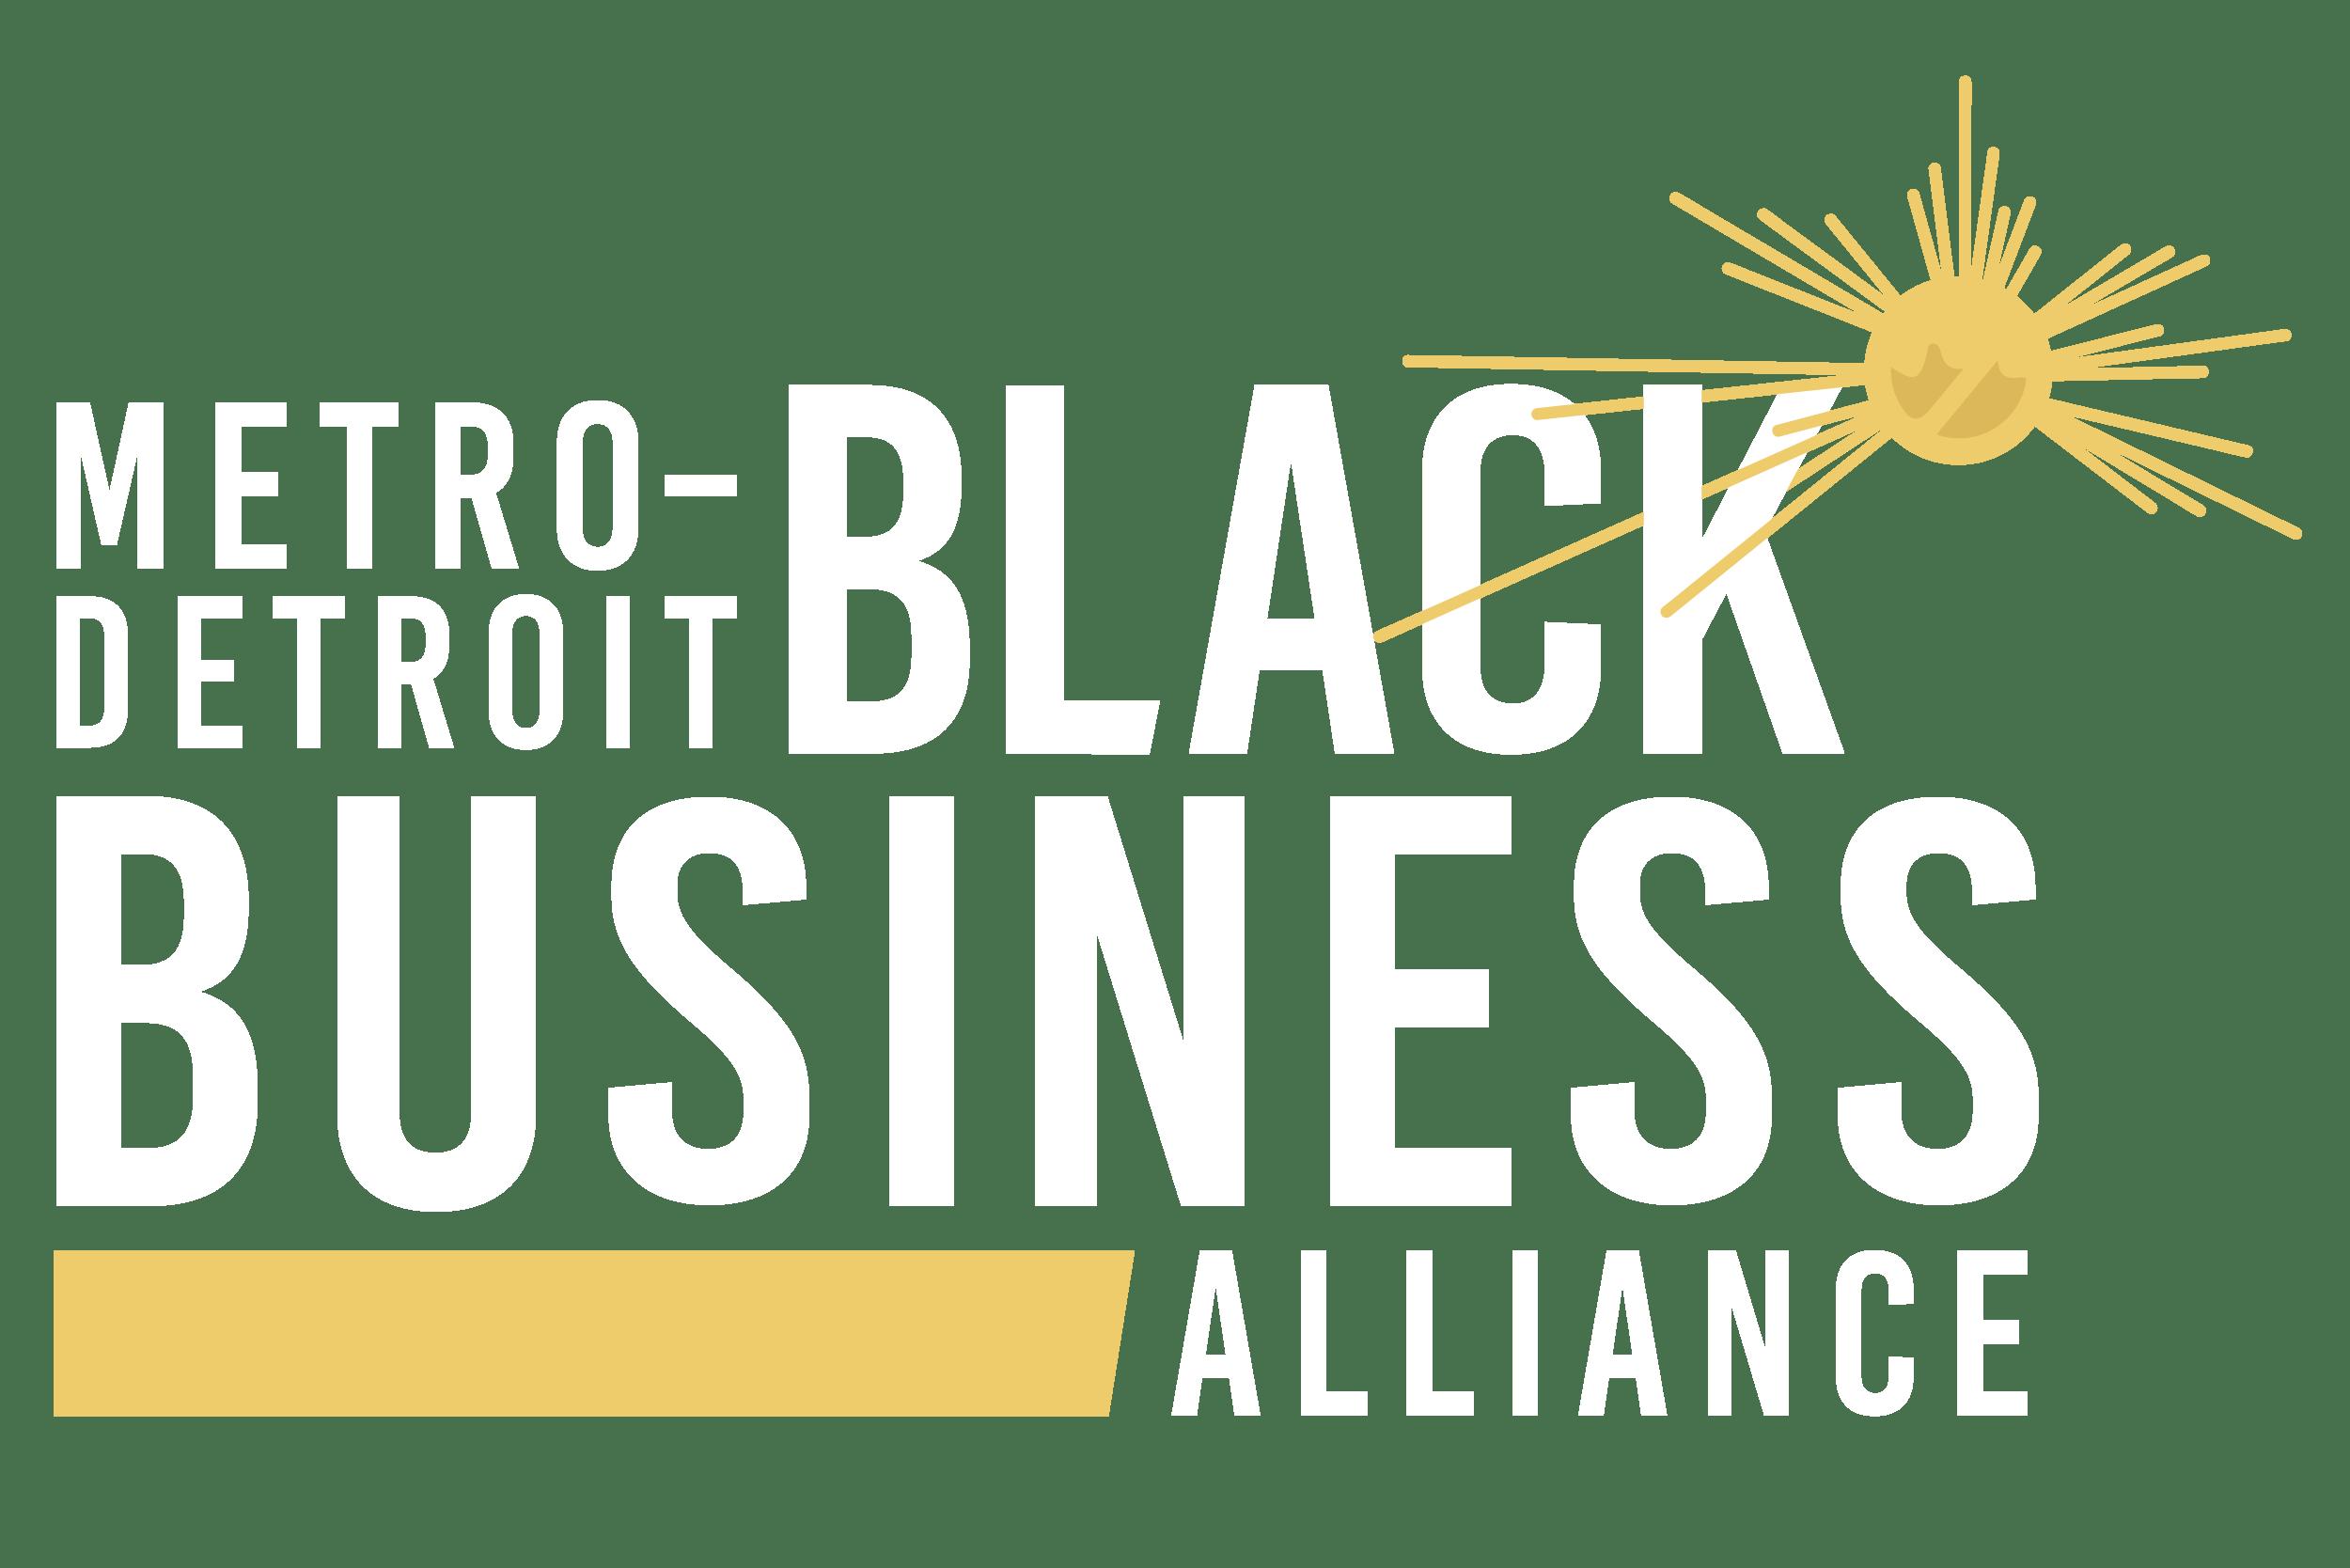 Metro-Detroit Black Business Alliance